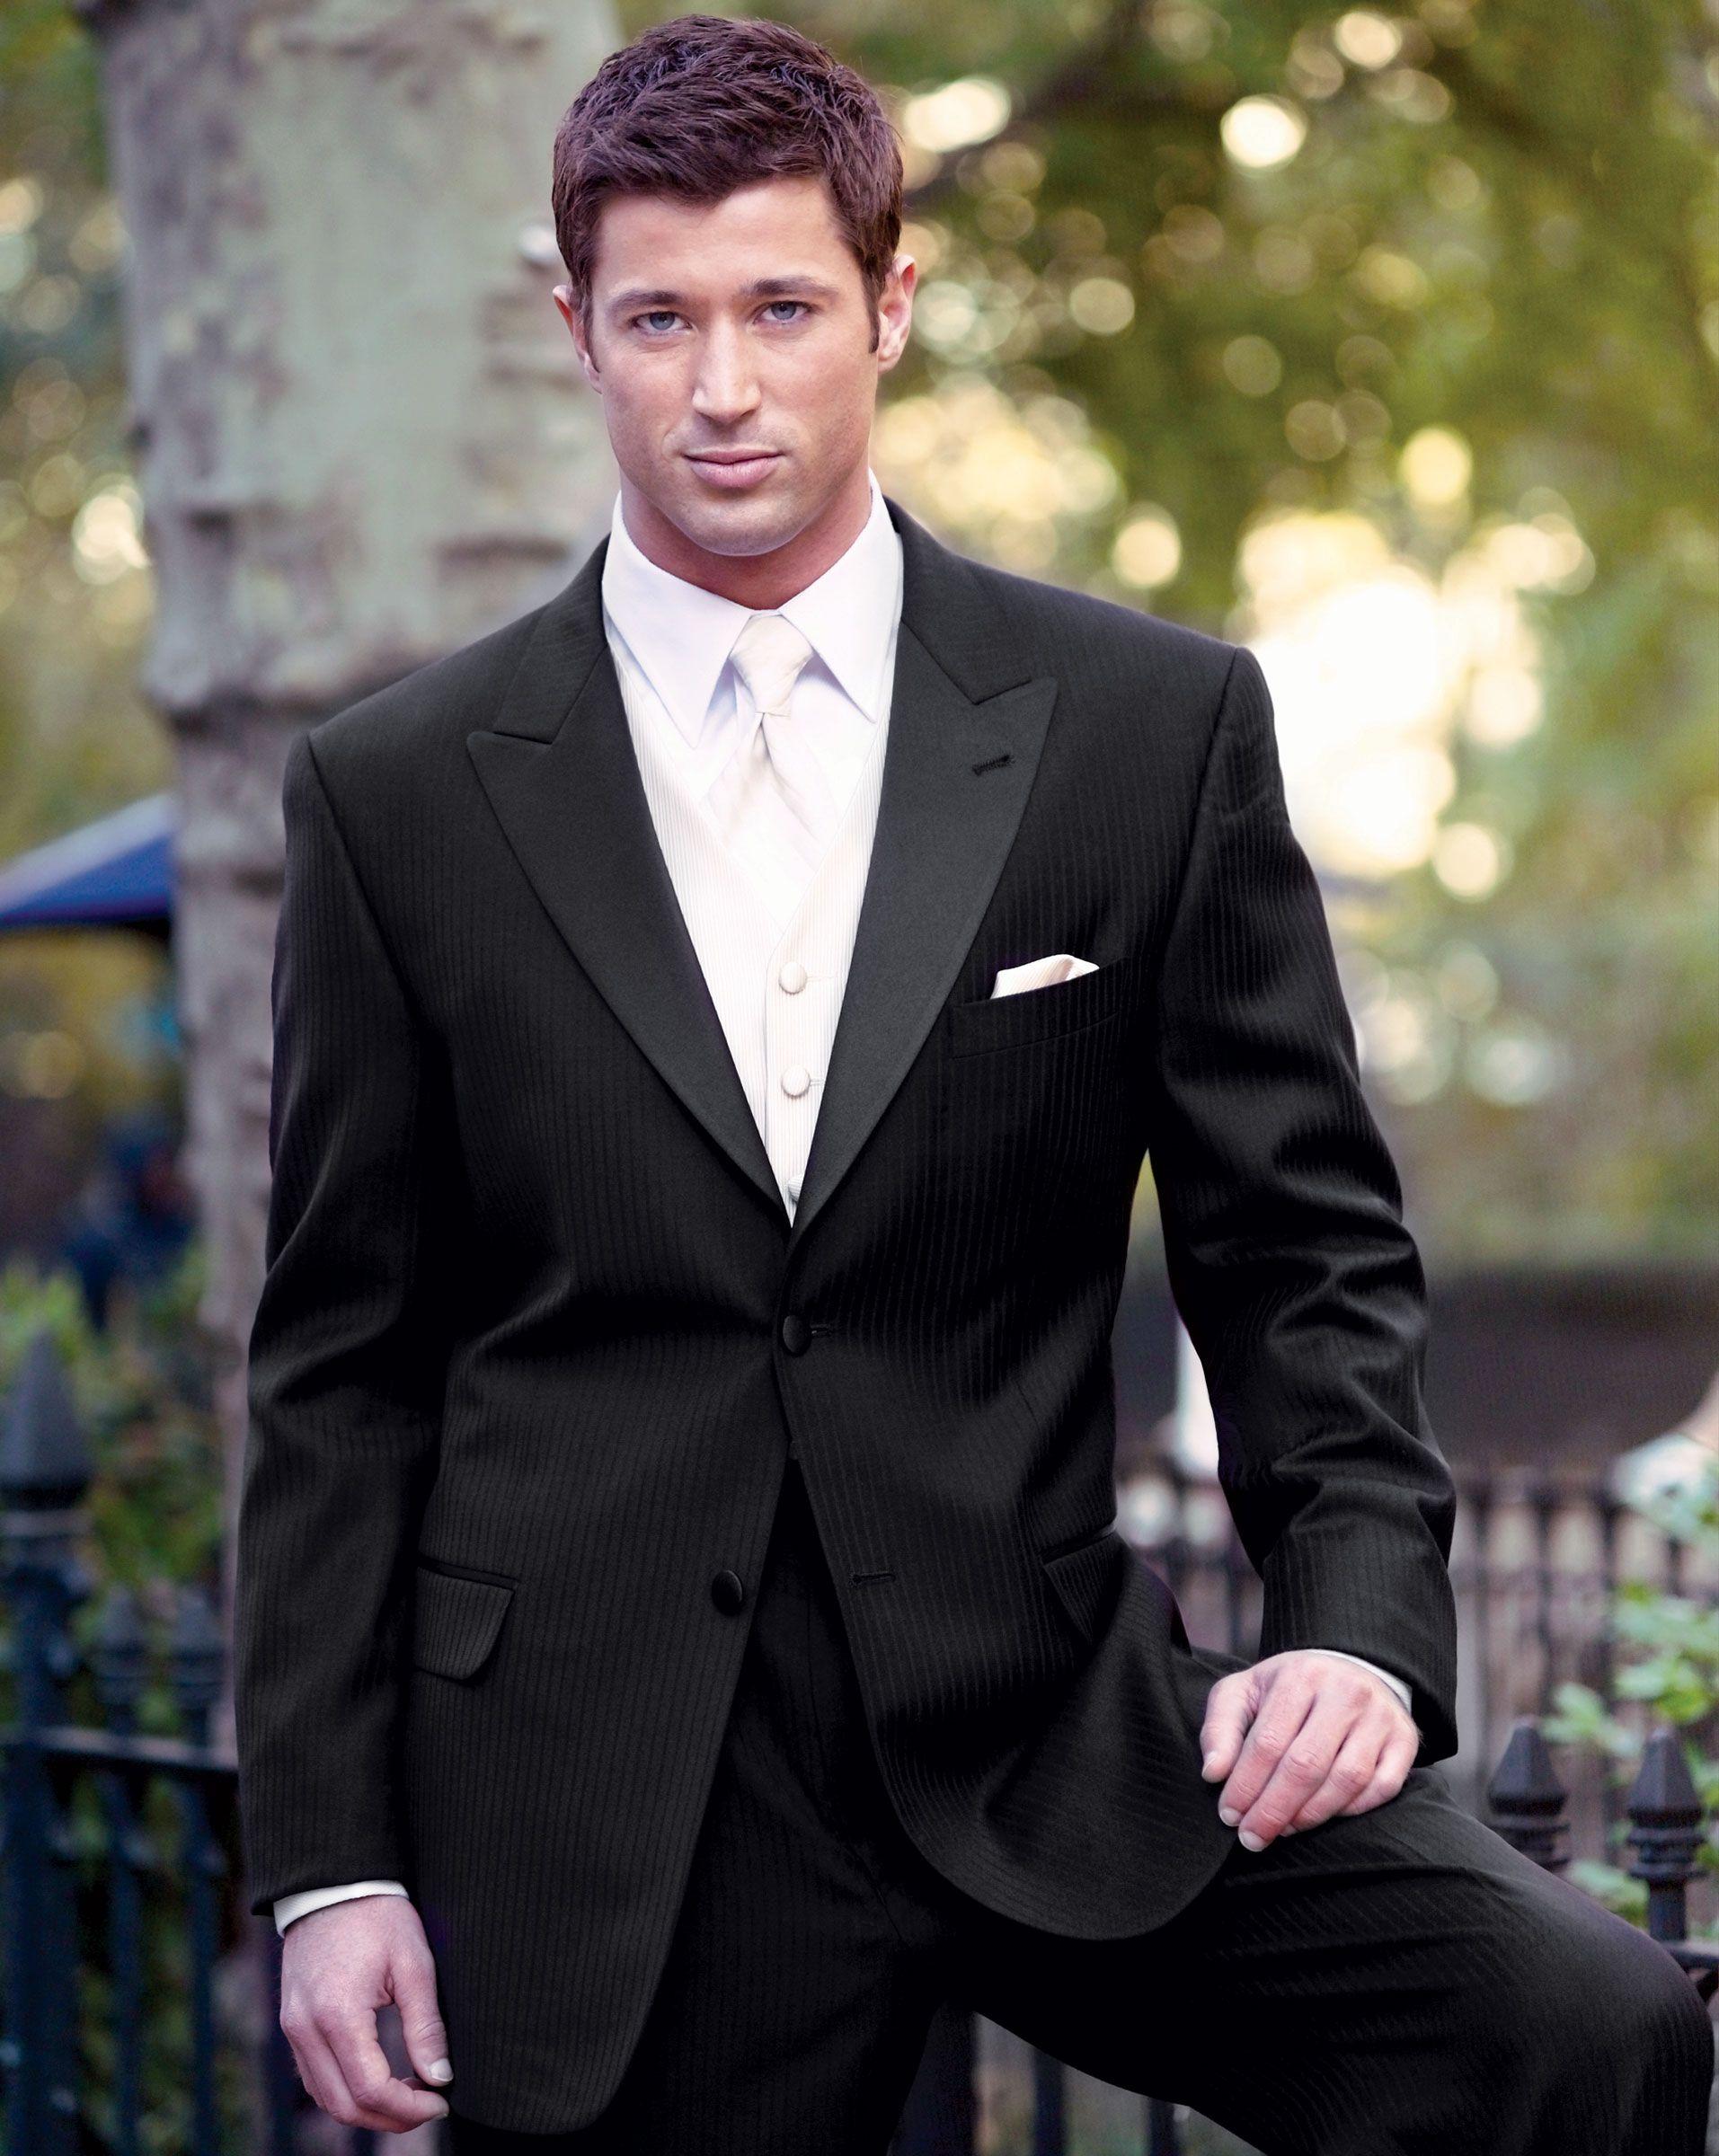 Designer Wedding Tuxedos | Joseph-Abboud-Tribeca-Peak-White-Vest ...